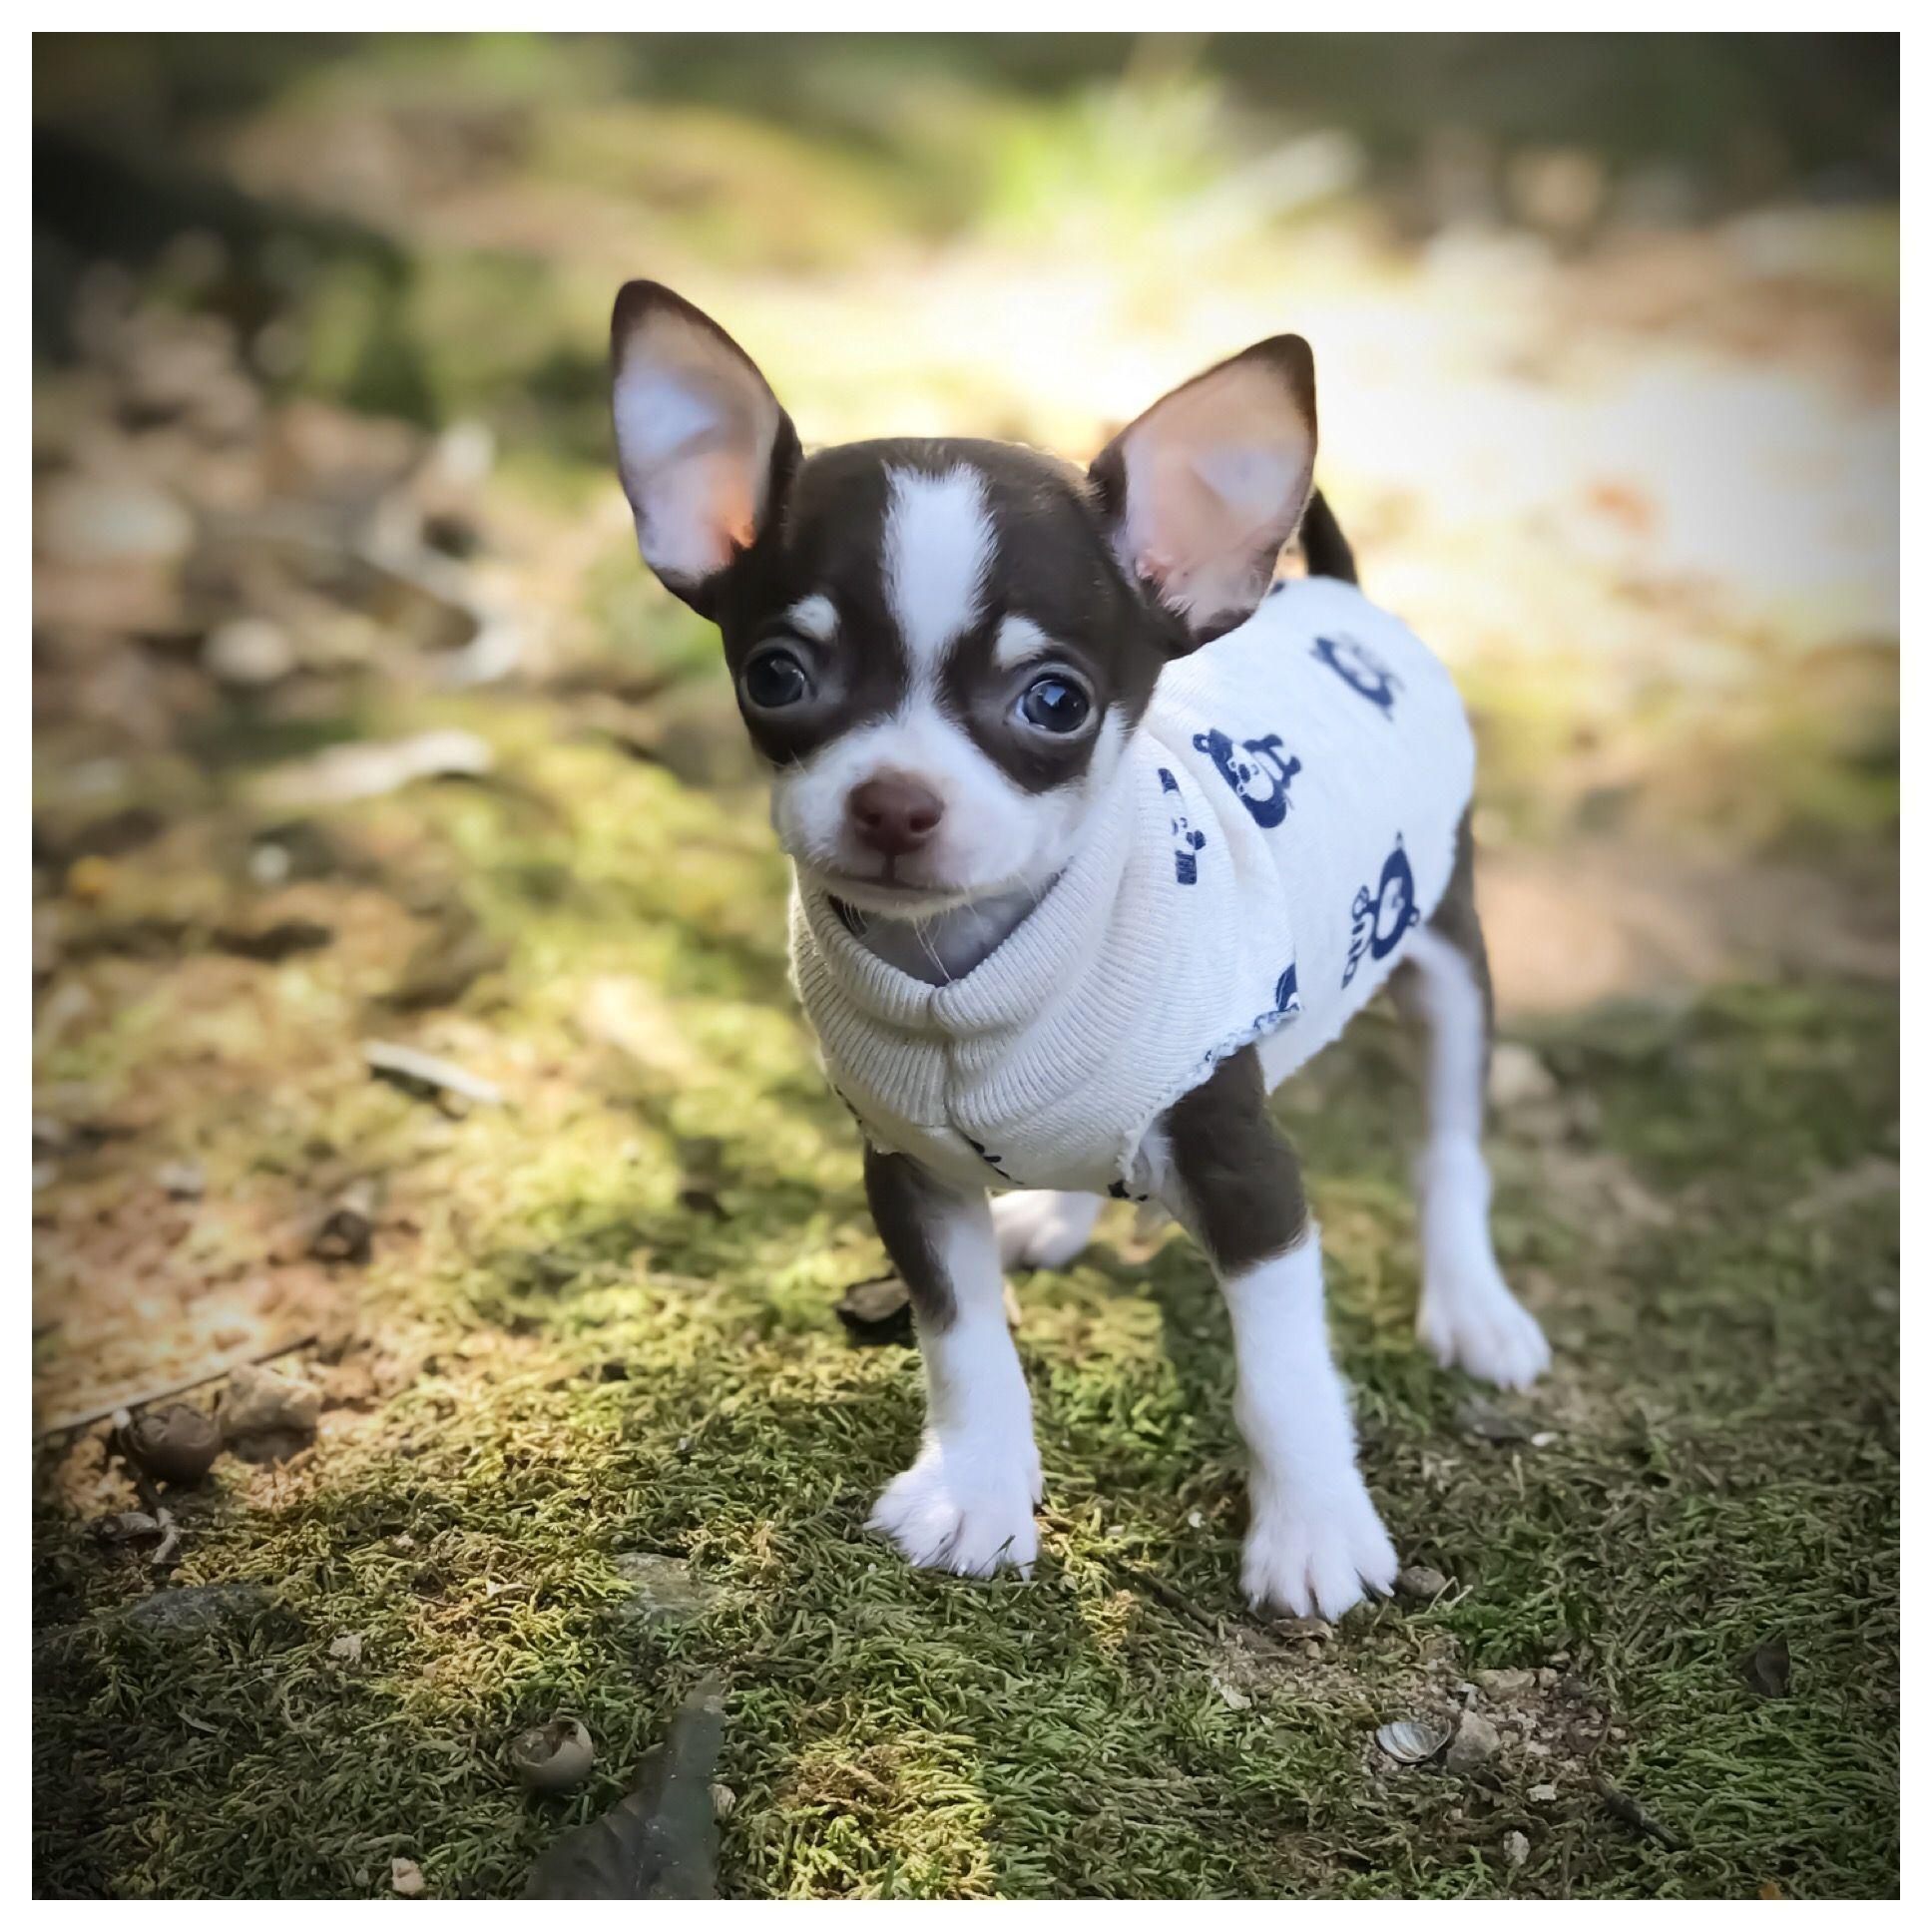 Cute chihuahua staying warm in a sweater #Chihuahua | Chihuahua ...